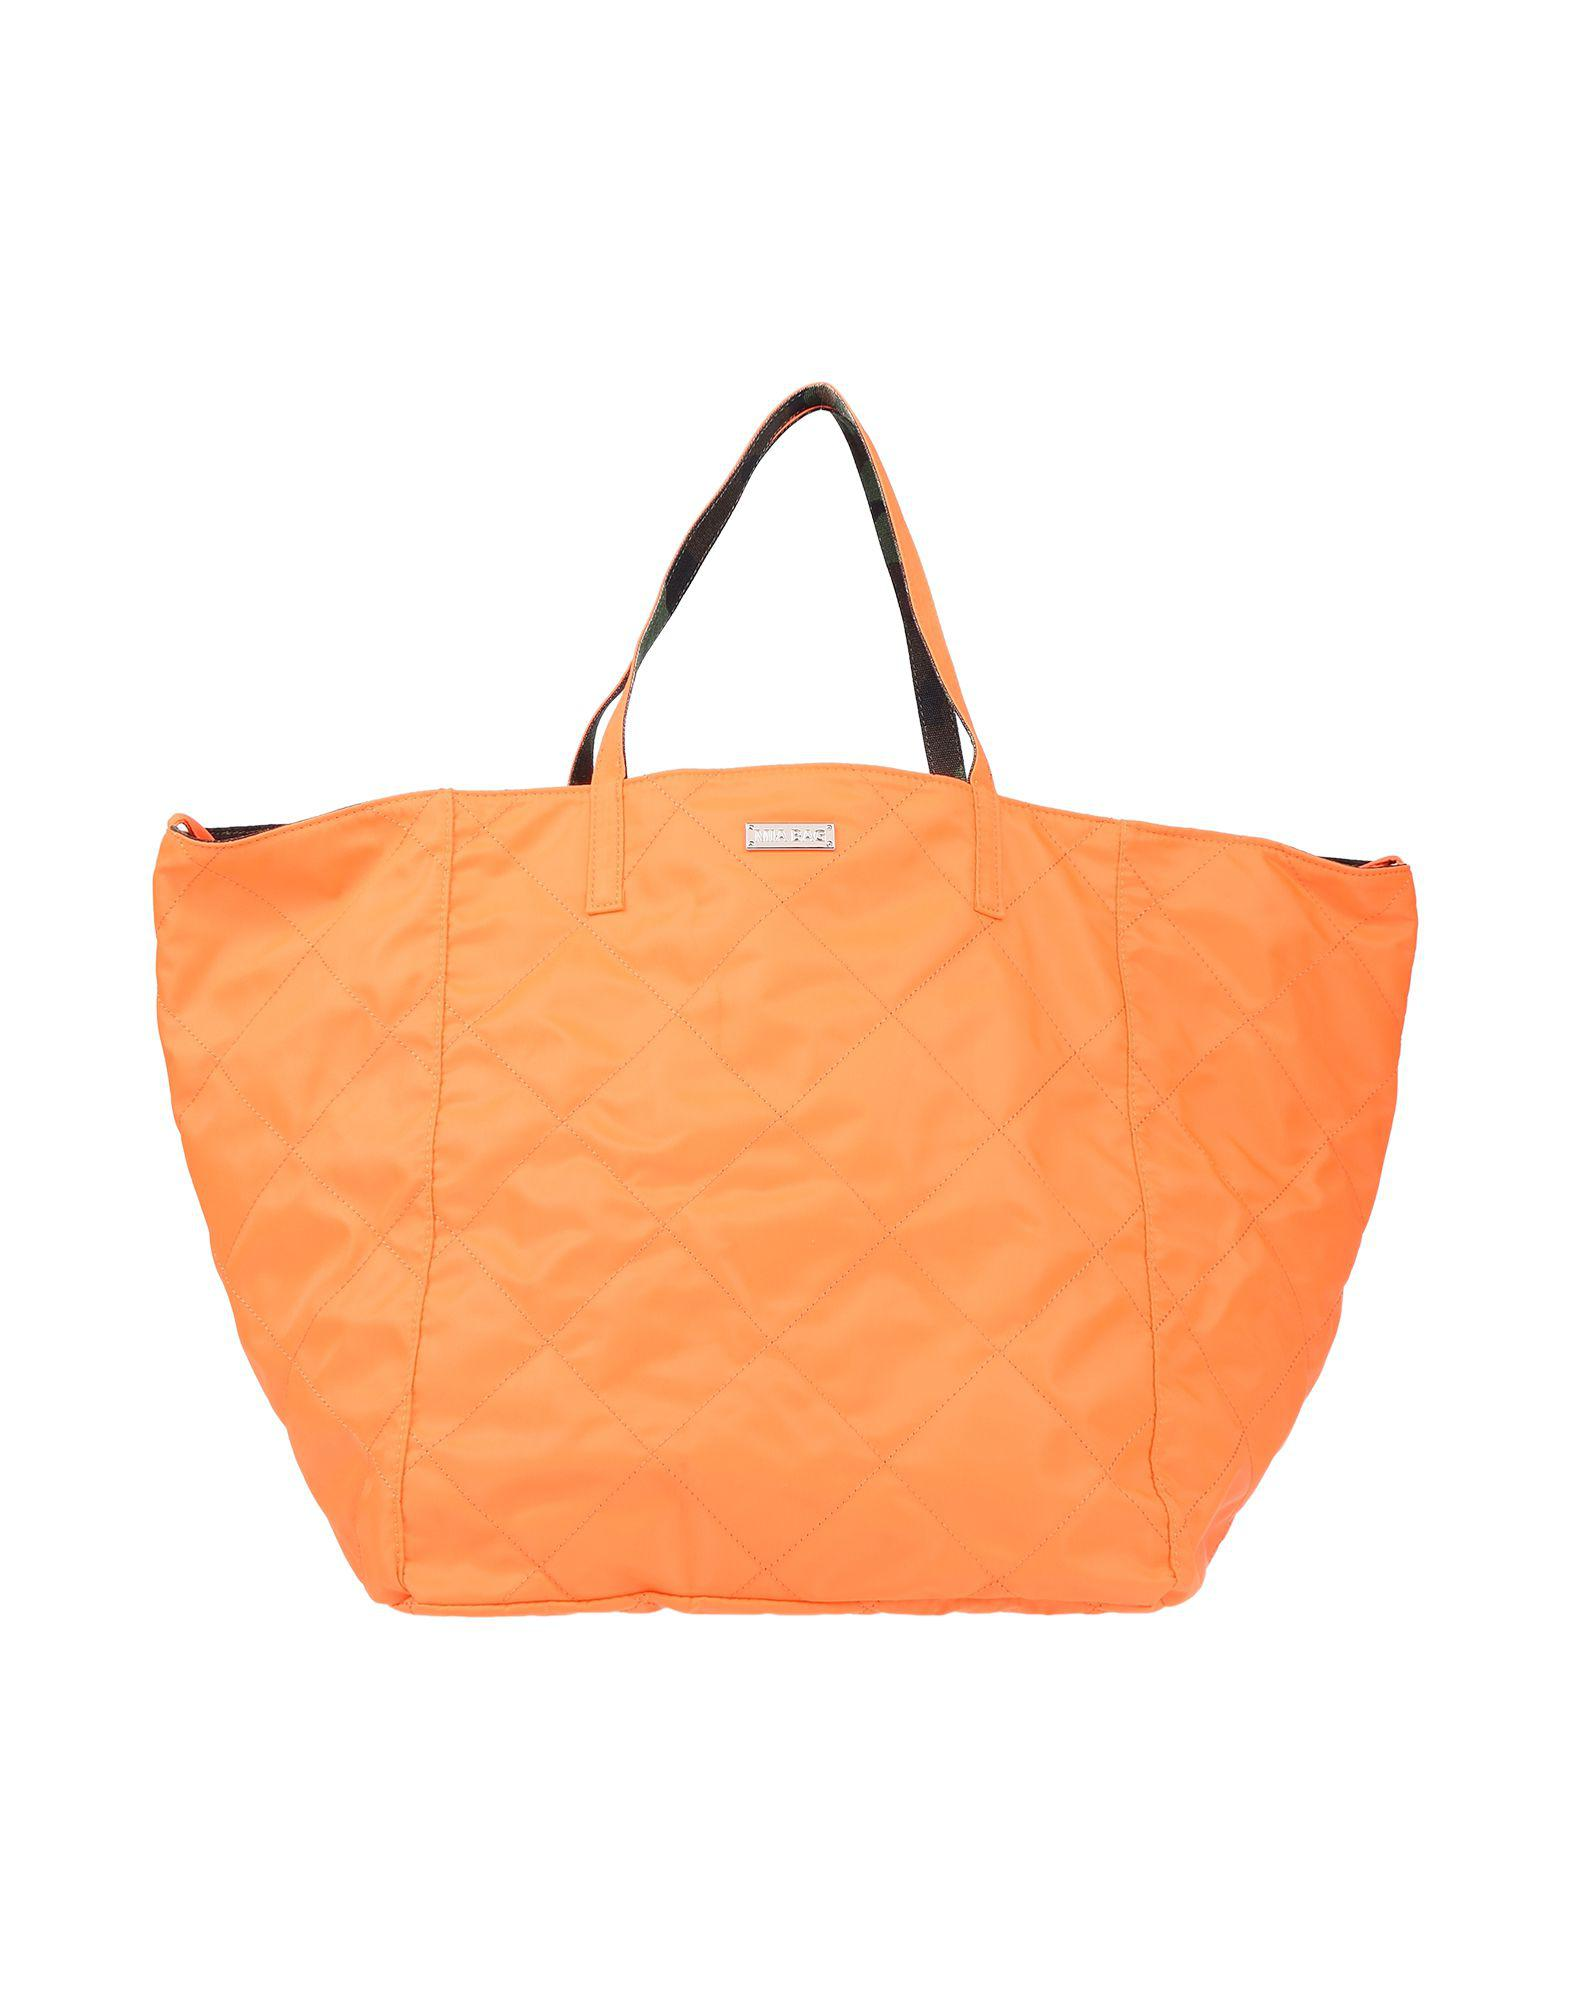 f36293c336 Lyst - Mia Bag Handbag in Orange